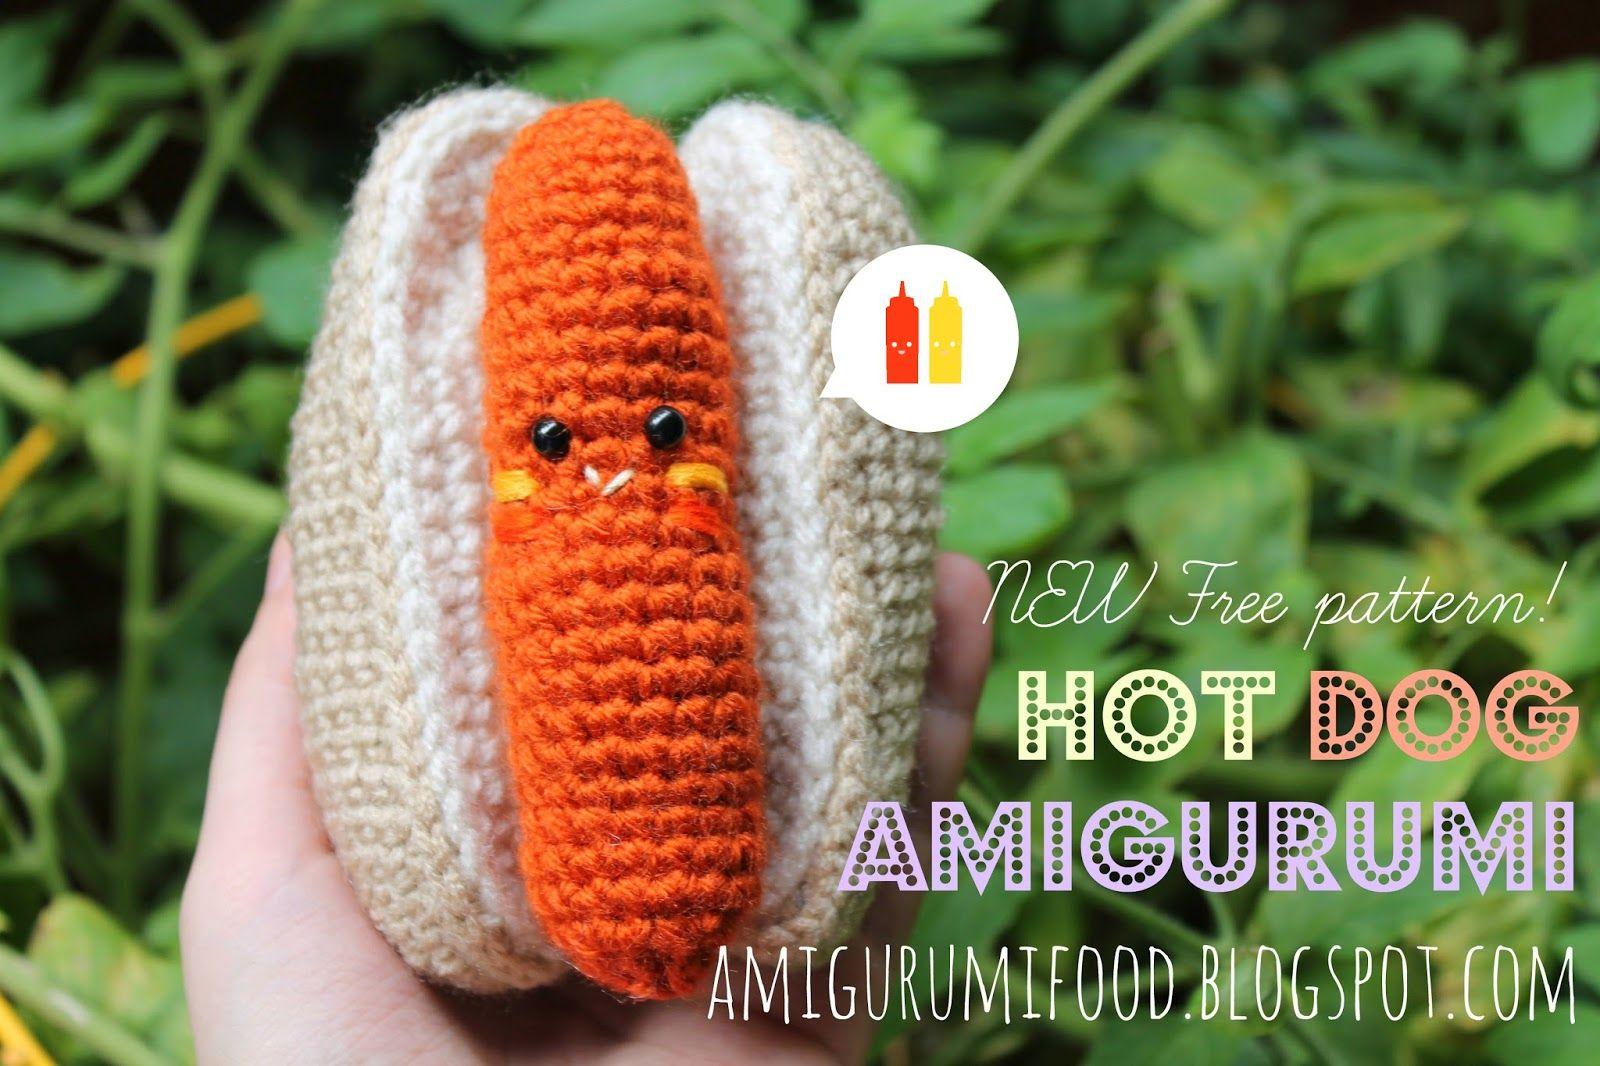 Amigurumi food hot dog free pattern english crochet food crochet amigurumi food hot dog free pattern bankloansurffo Choice Image